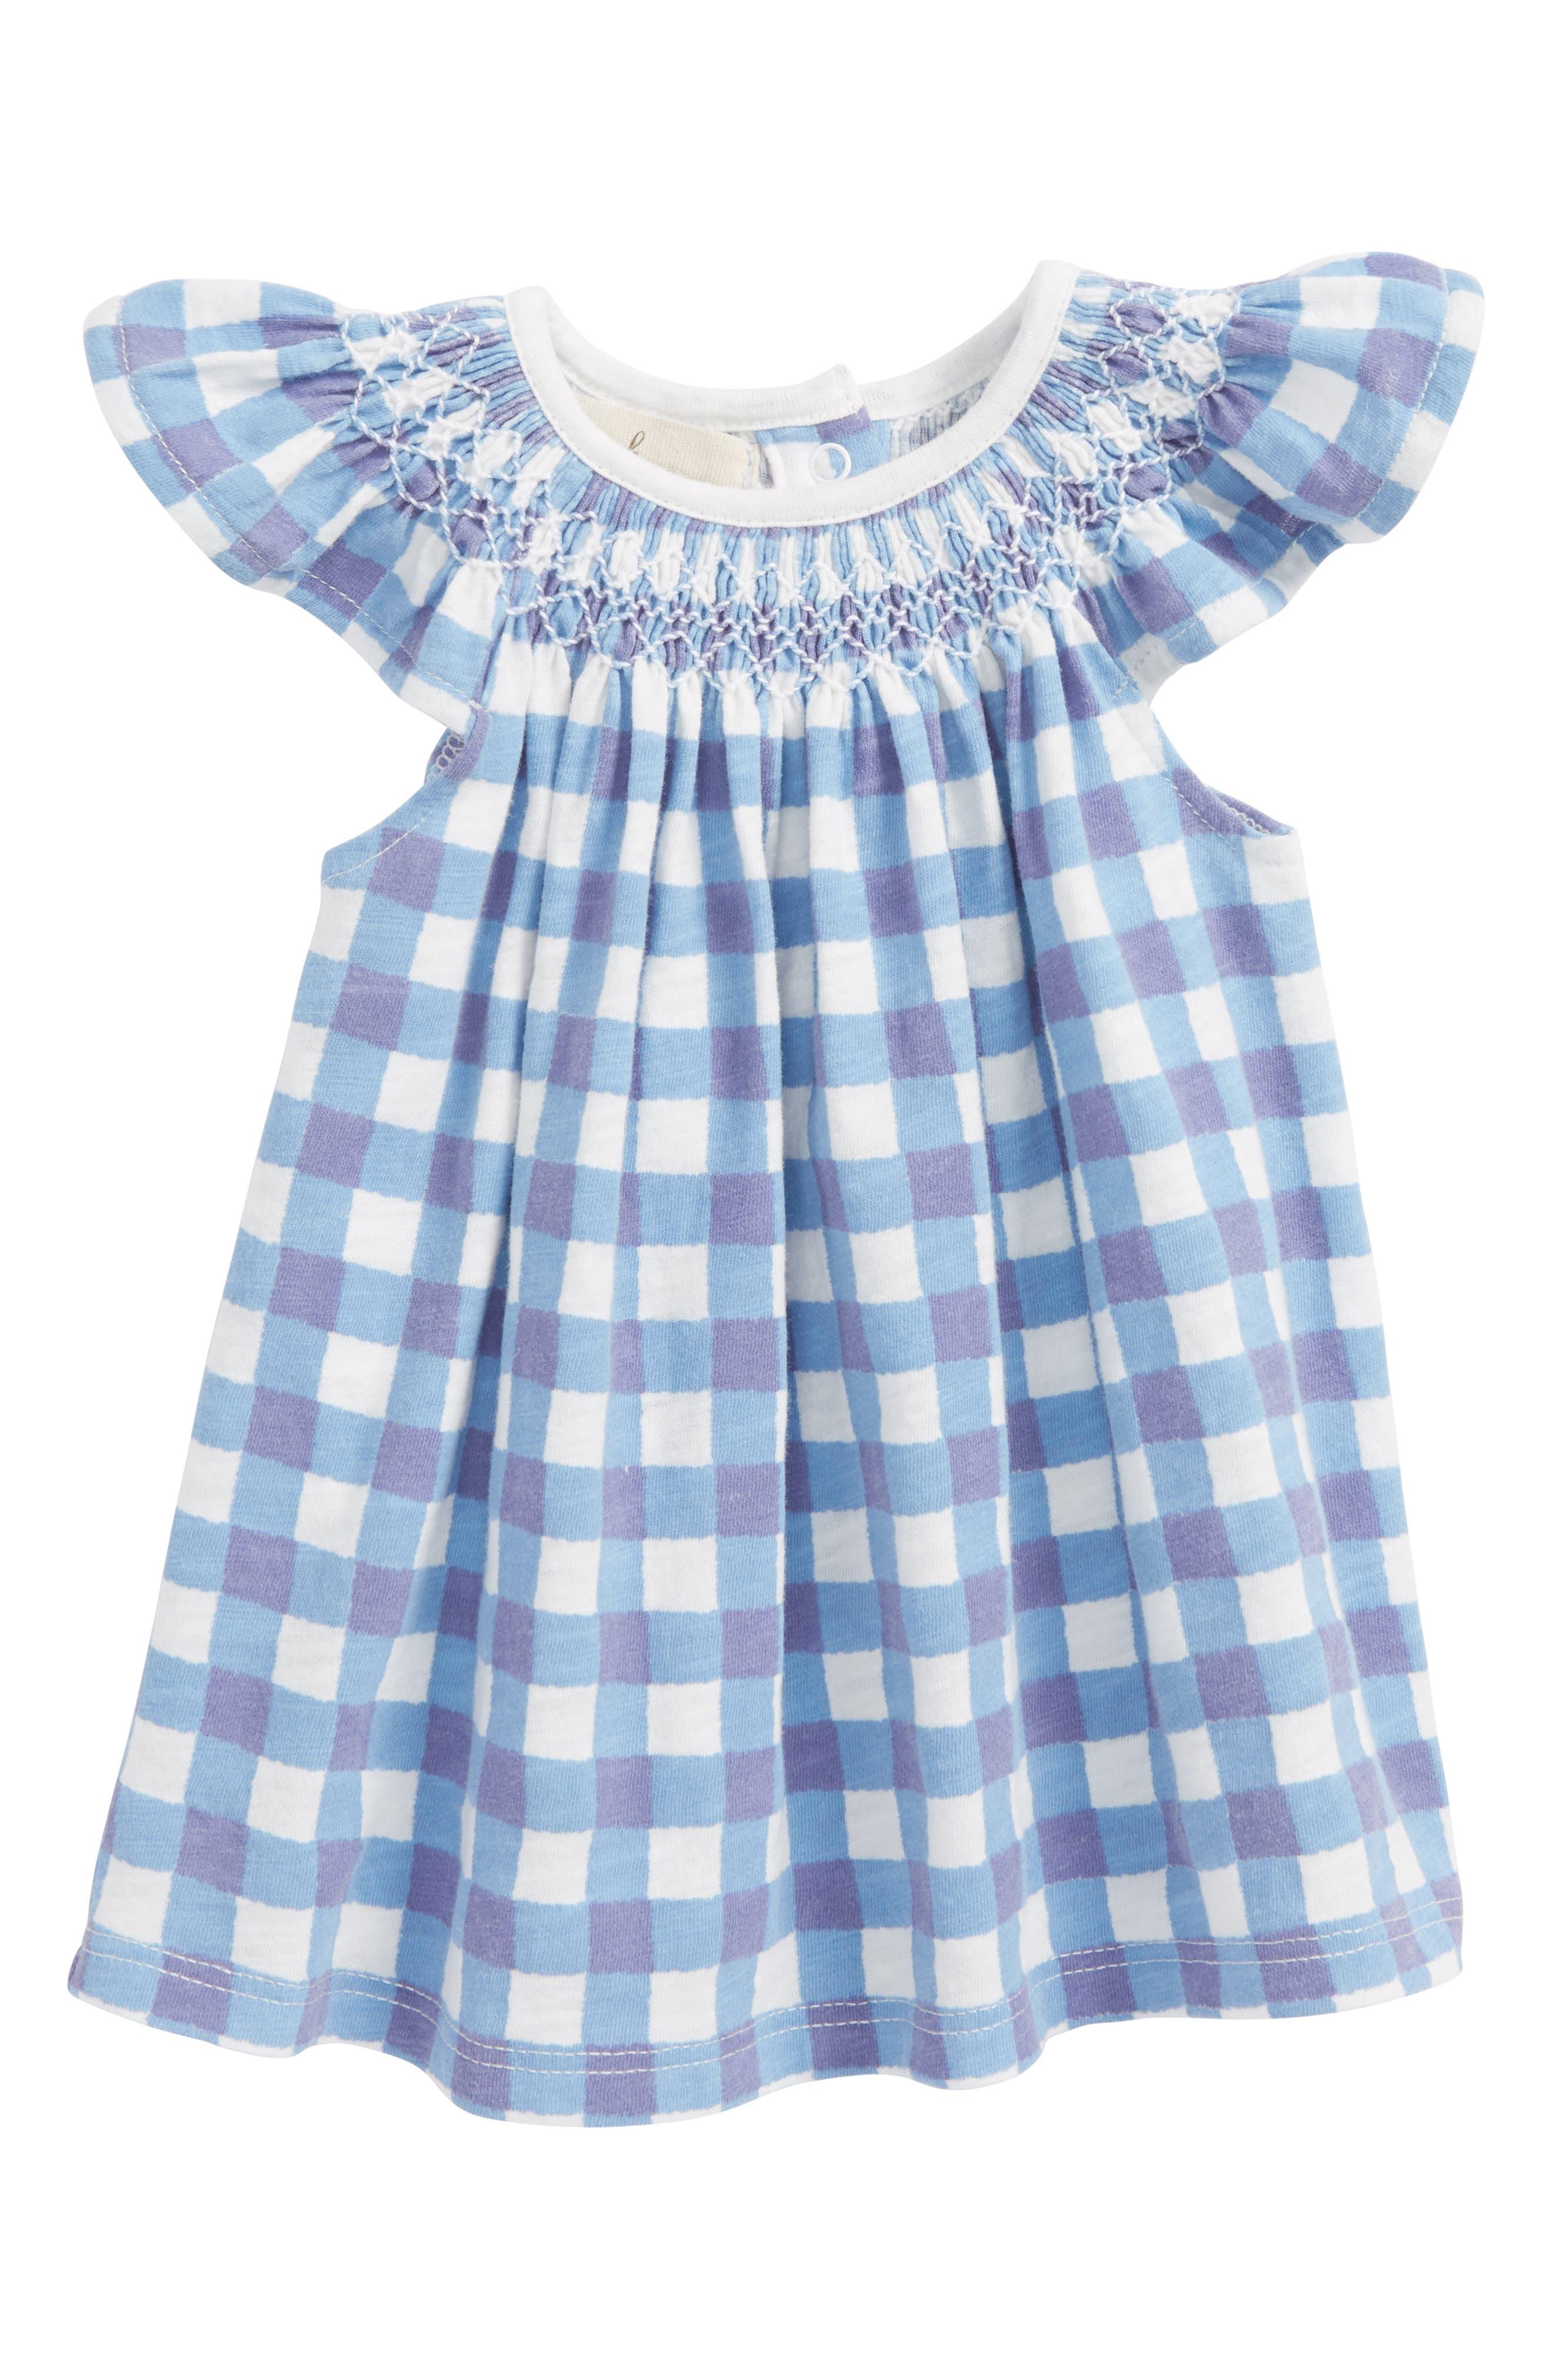 Peek Smocked Gingham Dress,                             Main thumbnail 1, color,                             Periwinkle